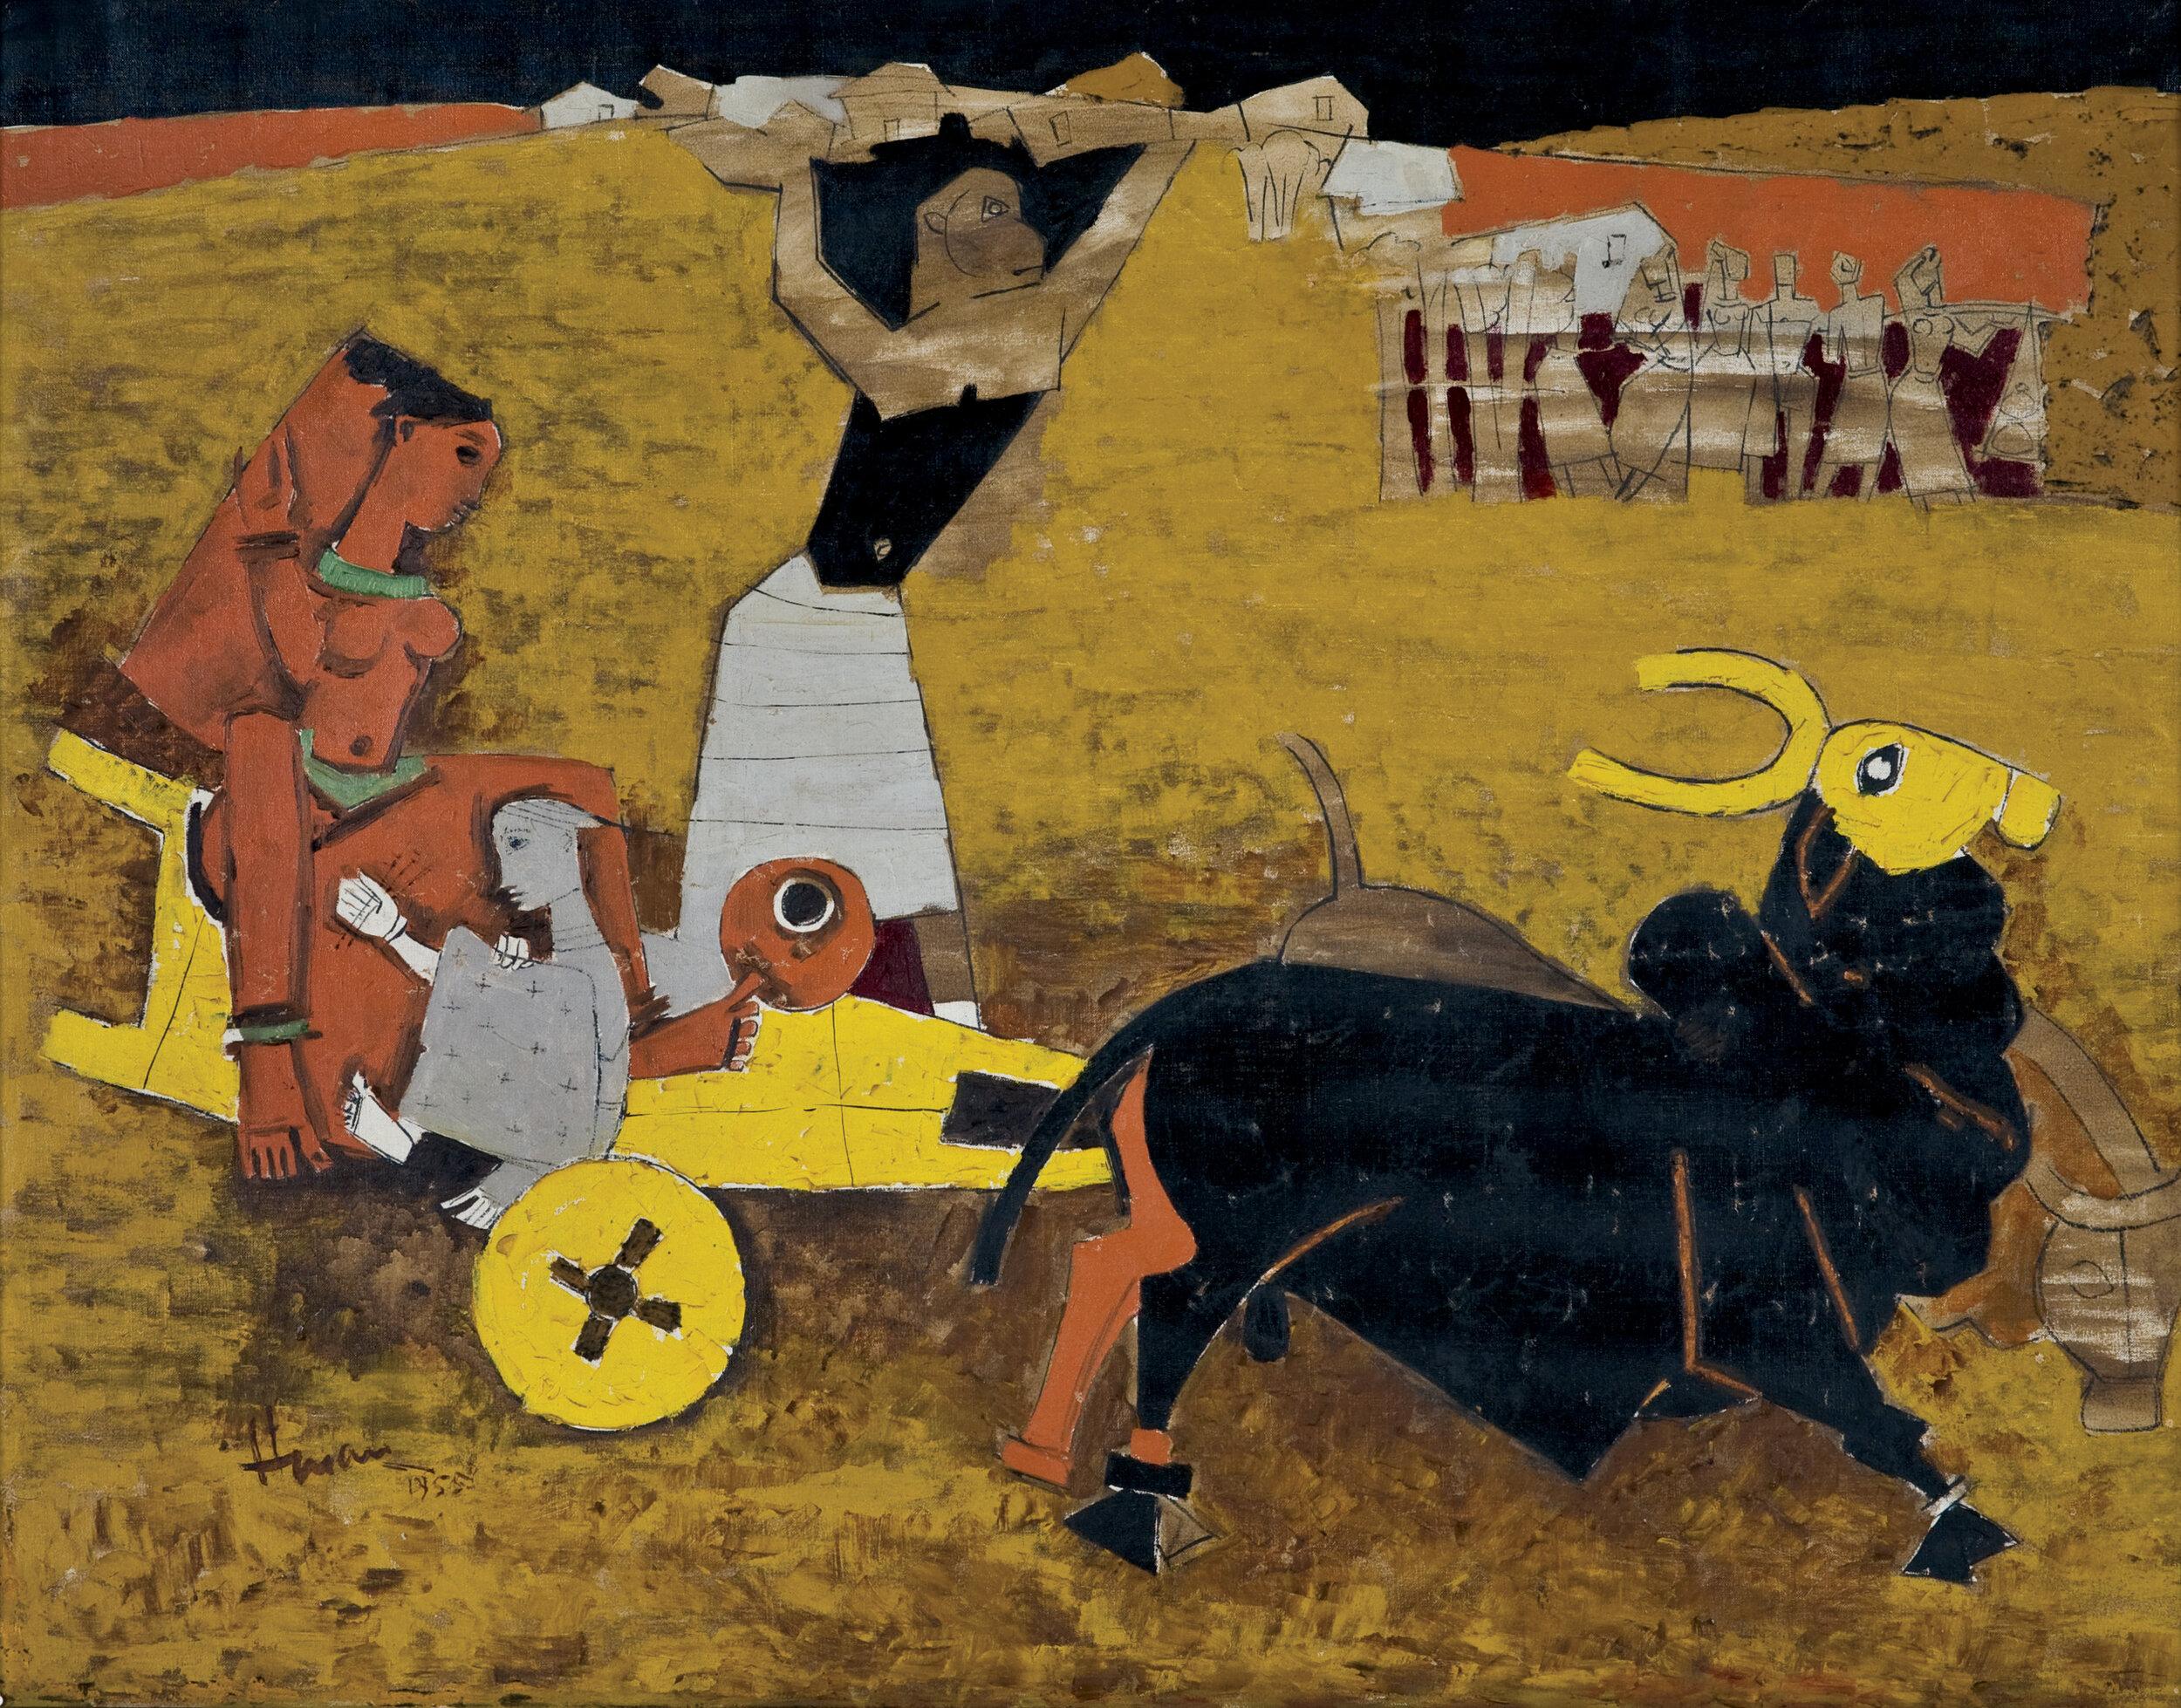 M. F. Husain  Yatra , 1955 Oil on canvas, H. 33 1/2 x W. 42 1/2 in. (85.1 x 108 cm) Collection Kiran Nadar Museum of Art, New Delhi